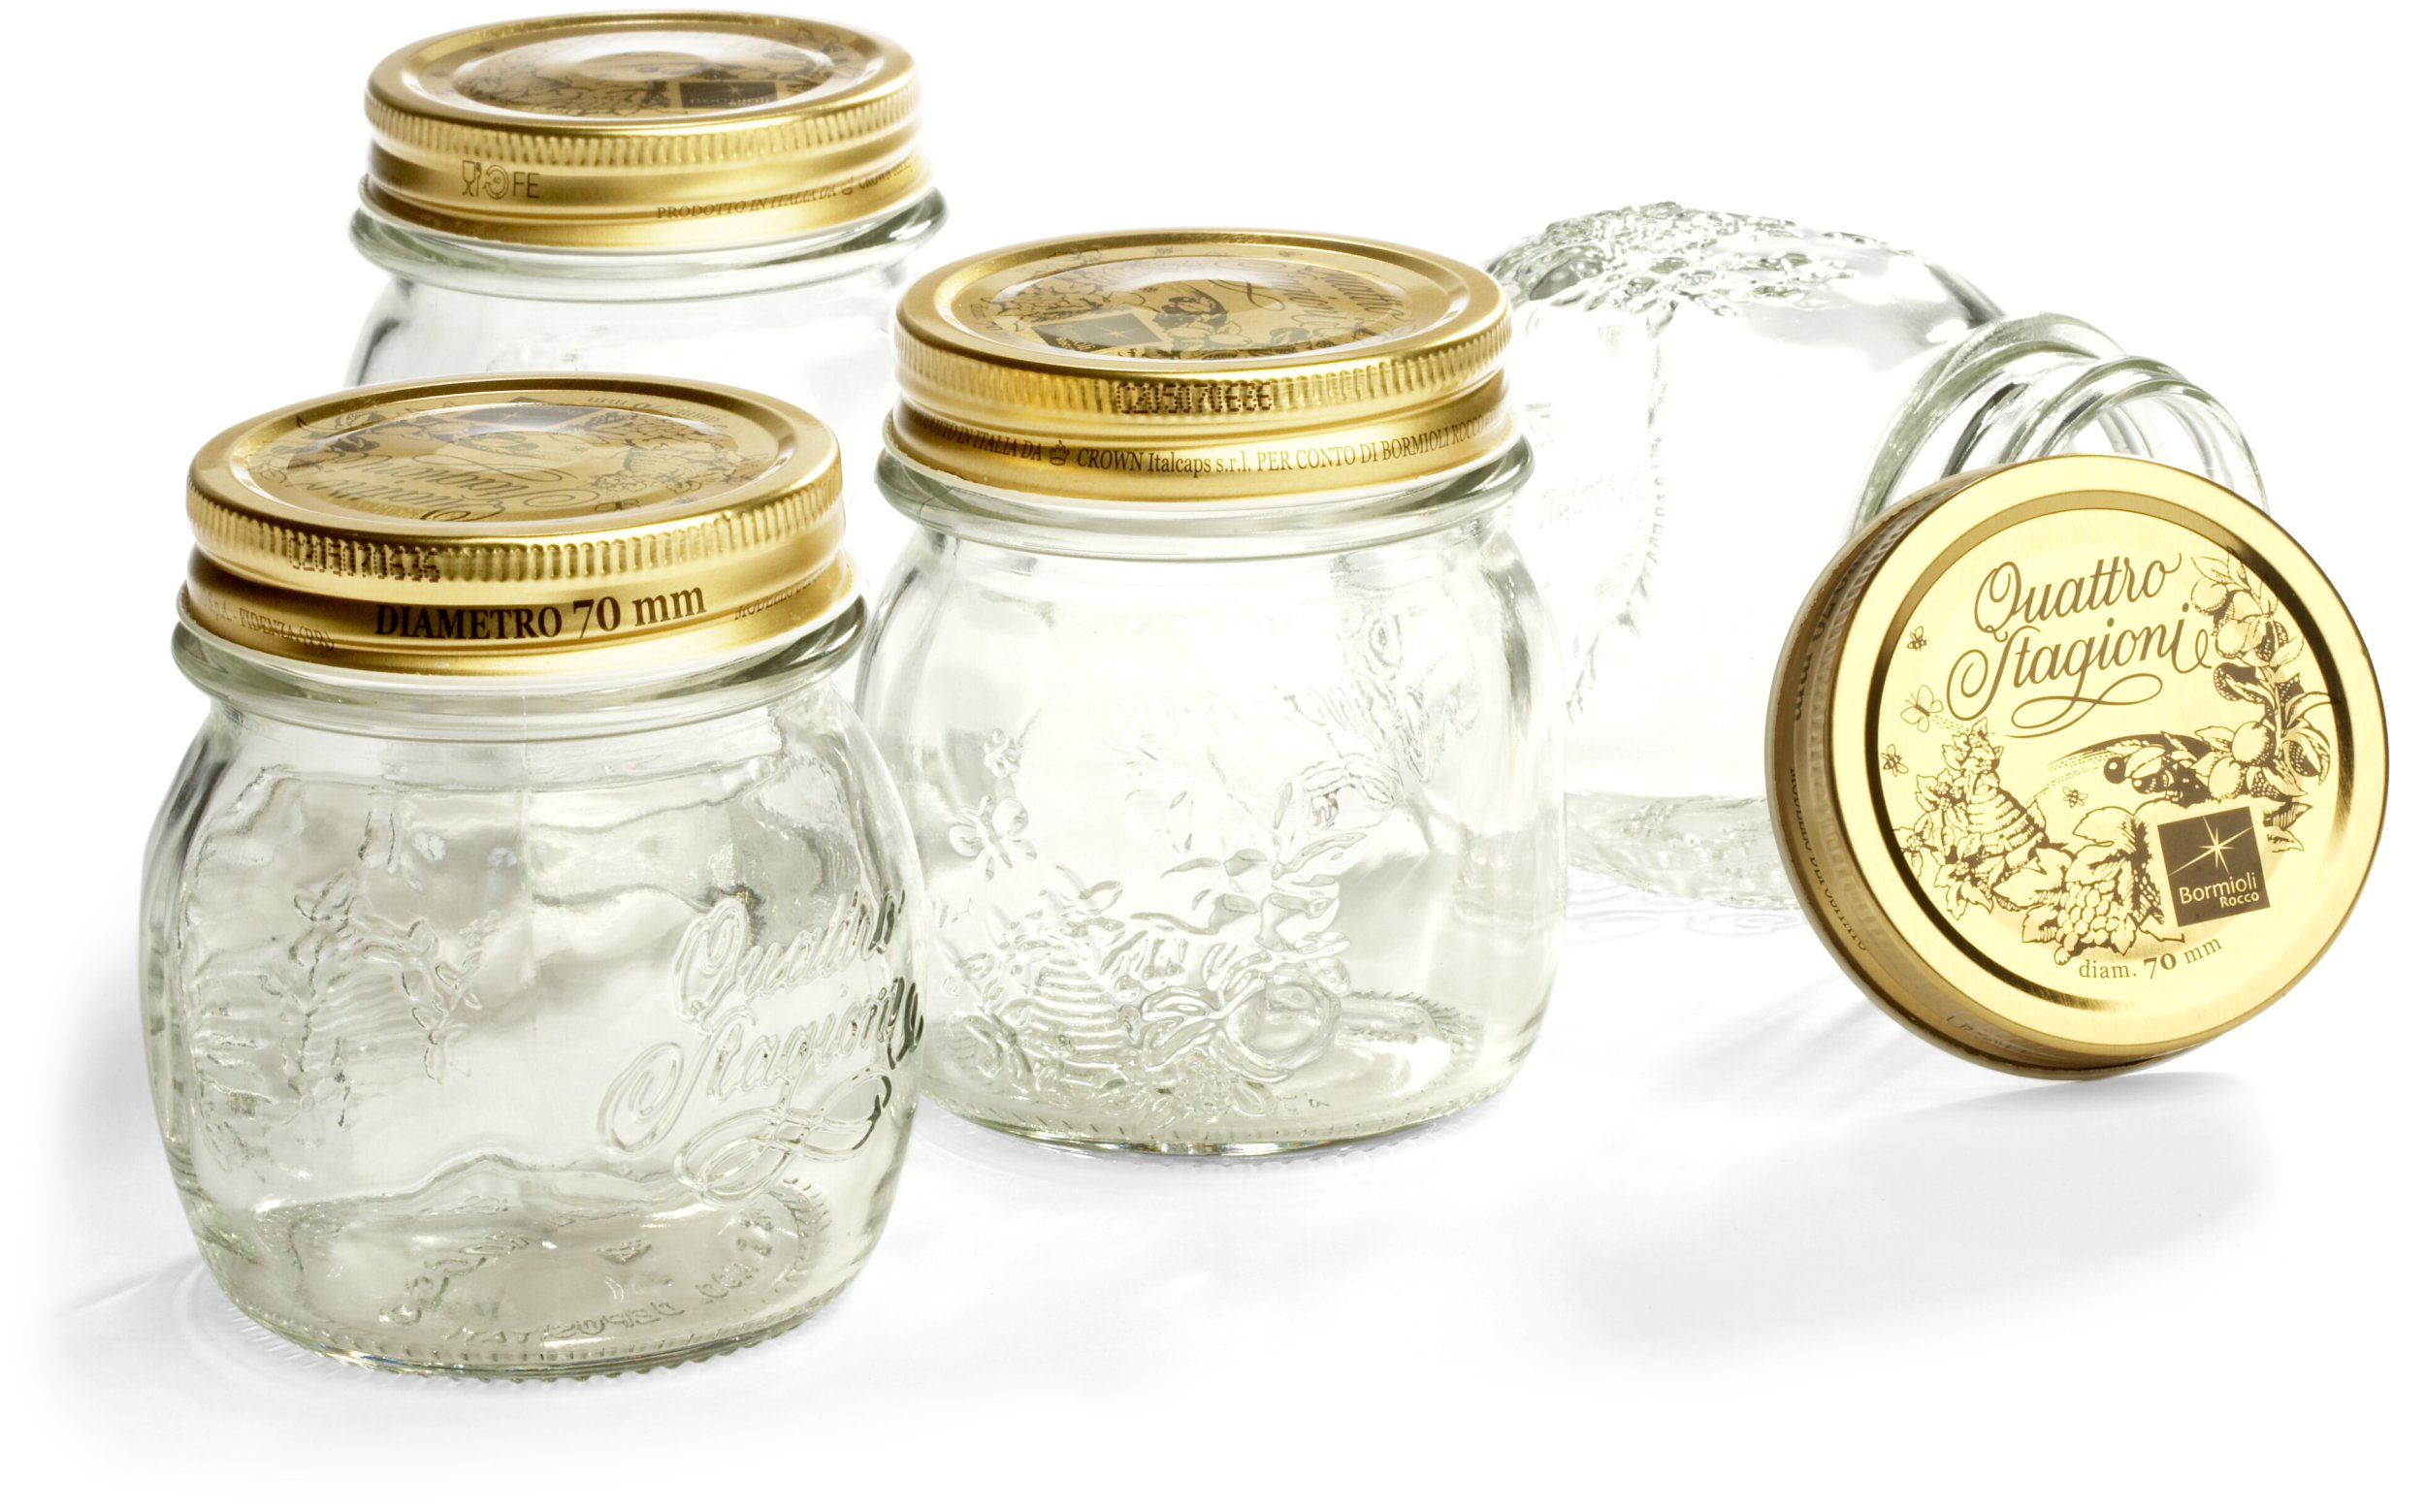 Bormioli Rocco Quattro Stagioni 8-1/2-Ounce 4-Piece Canning Jar Set, Gift Boxed by Bormioli Rocco (Image #1)